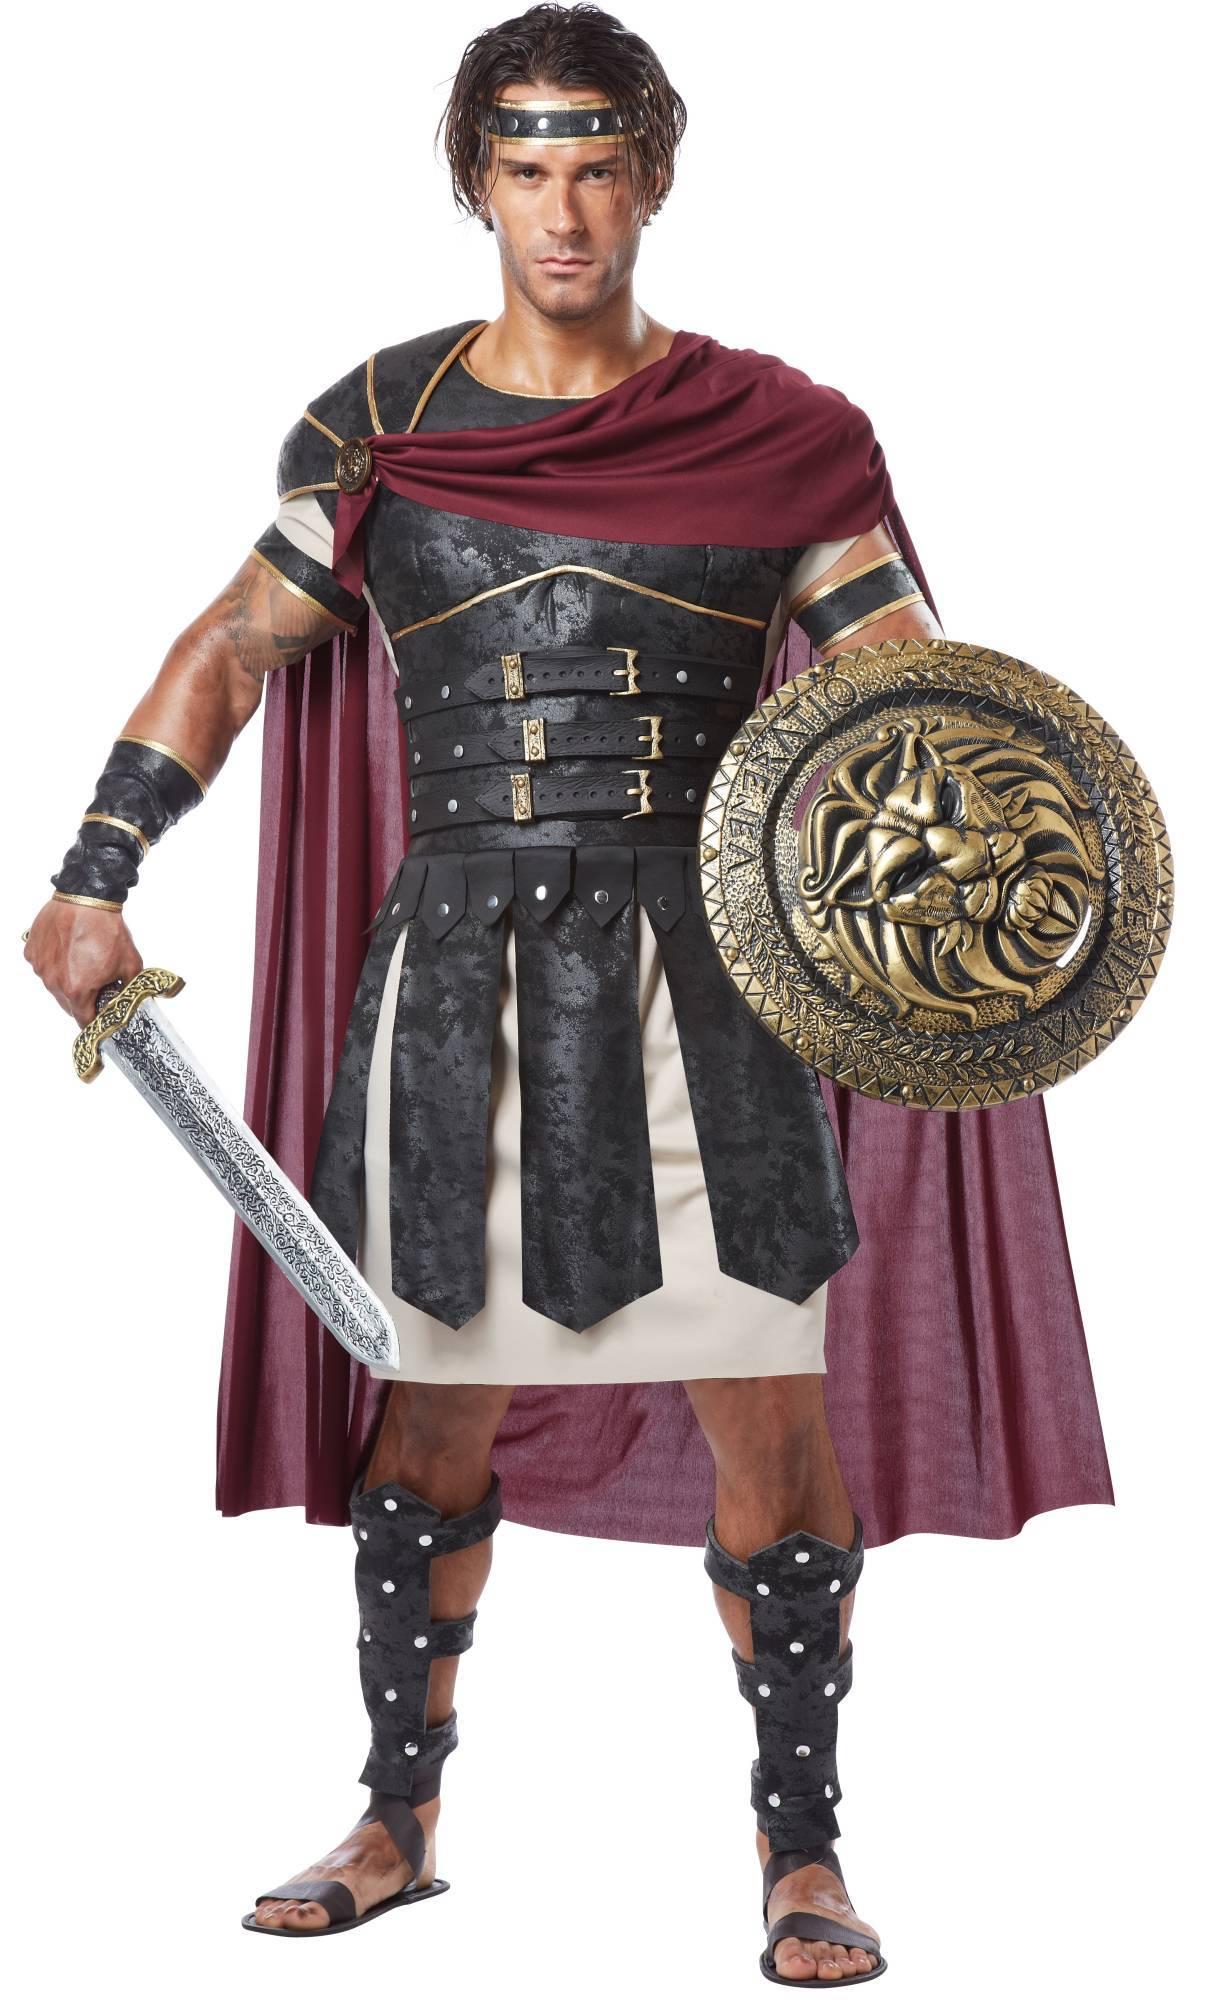 Costume-Centurion-Gladiateur